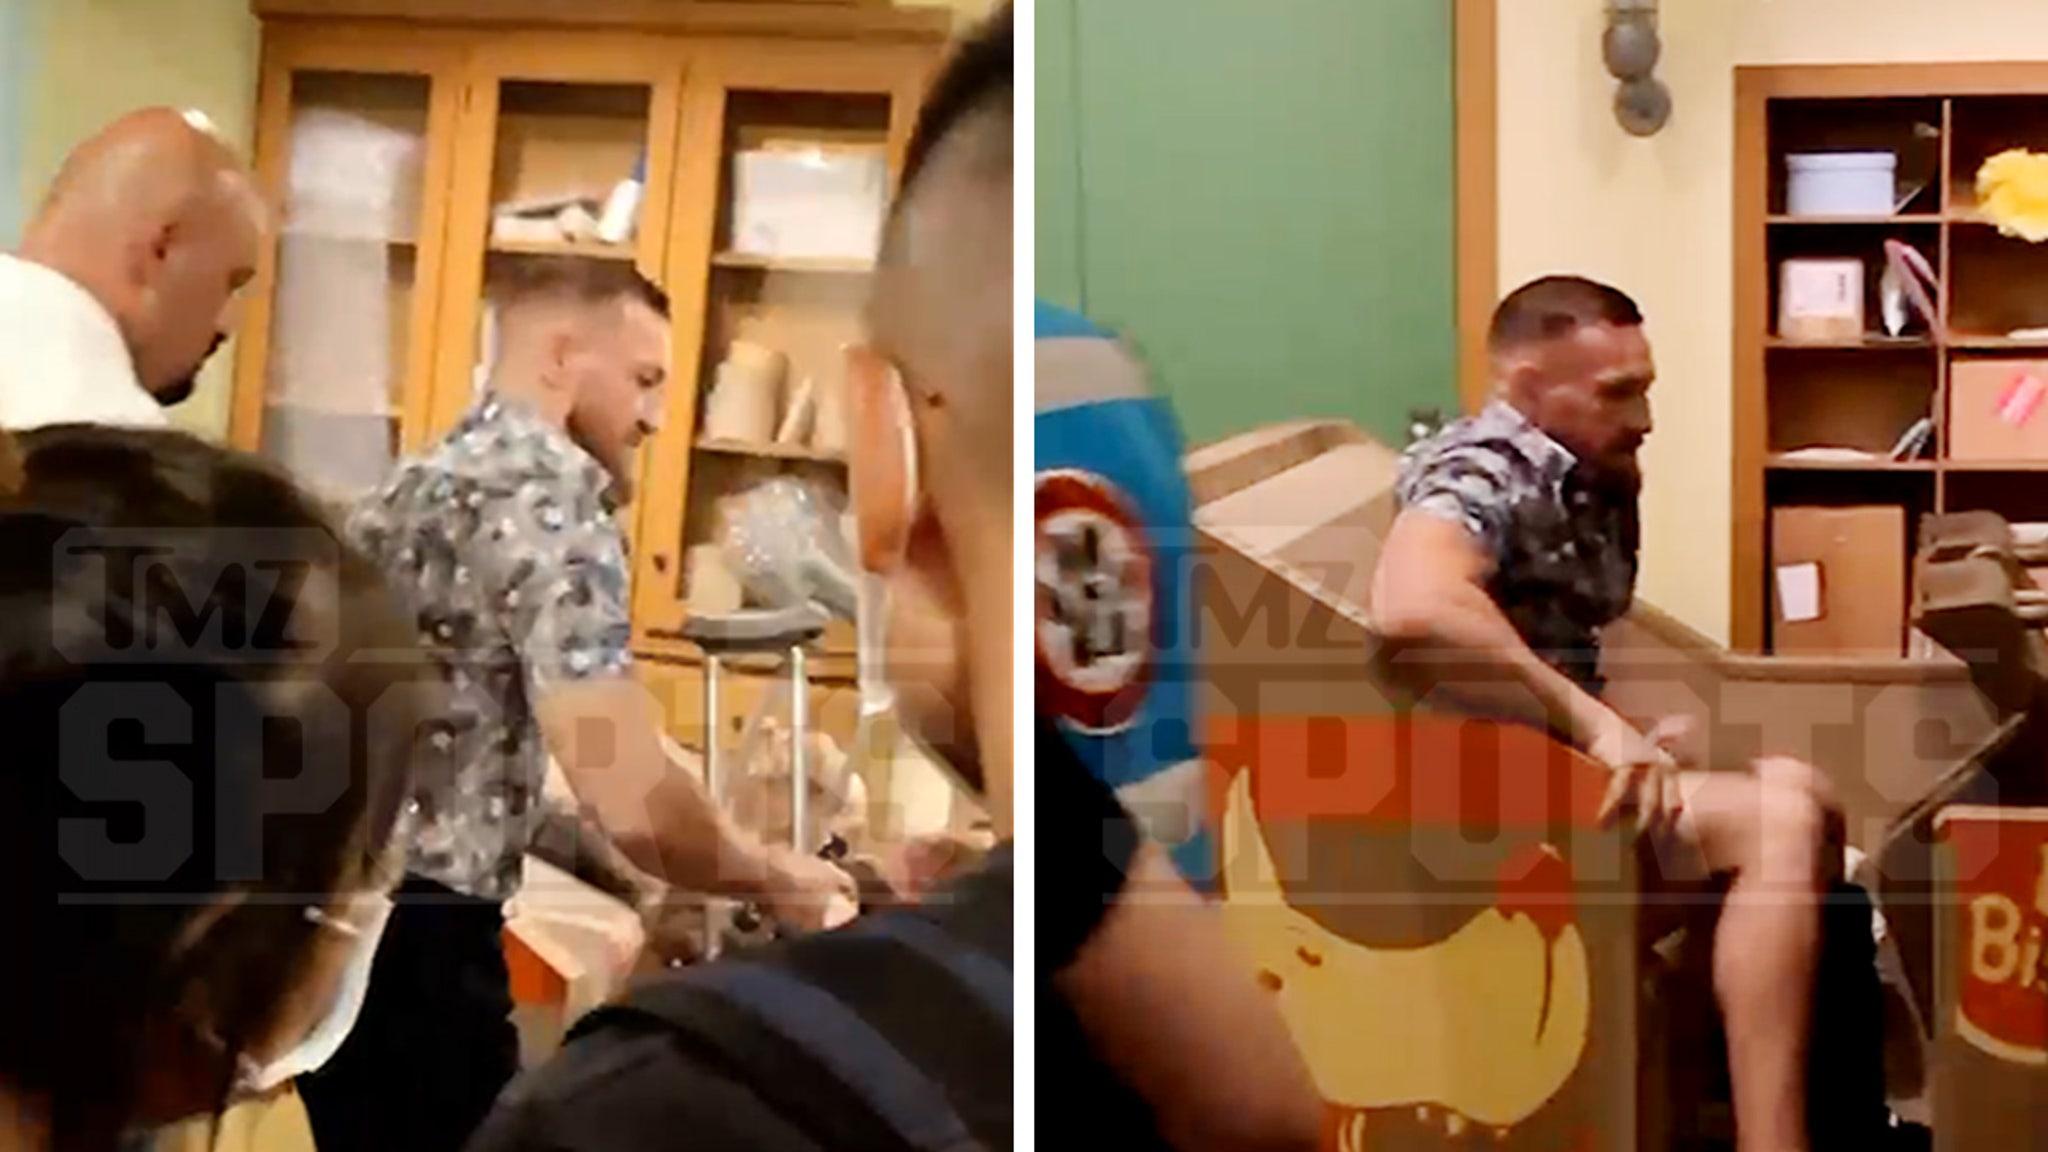 Conor McGregor Hits Universal Studios on Crutches